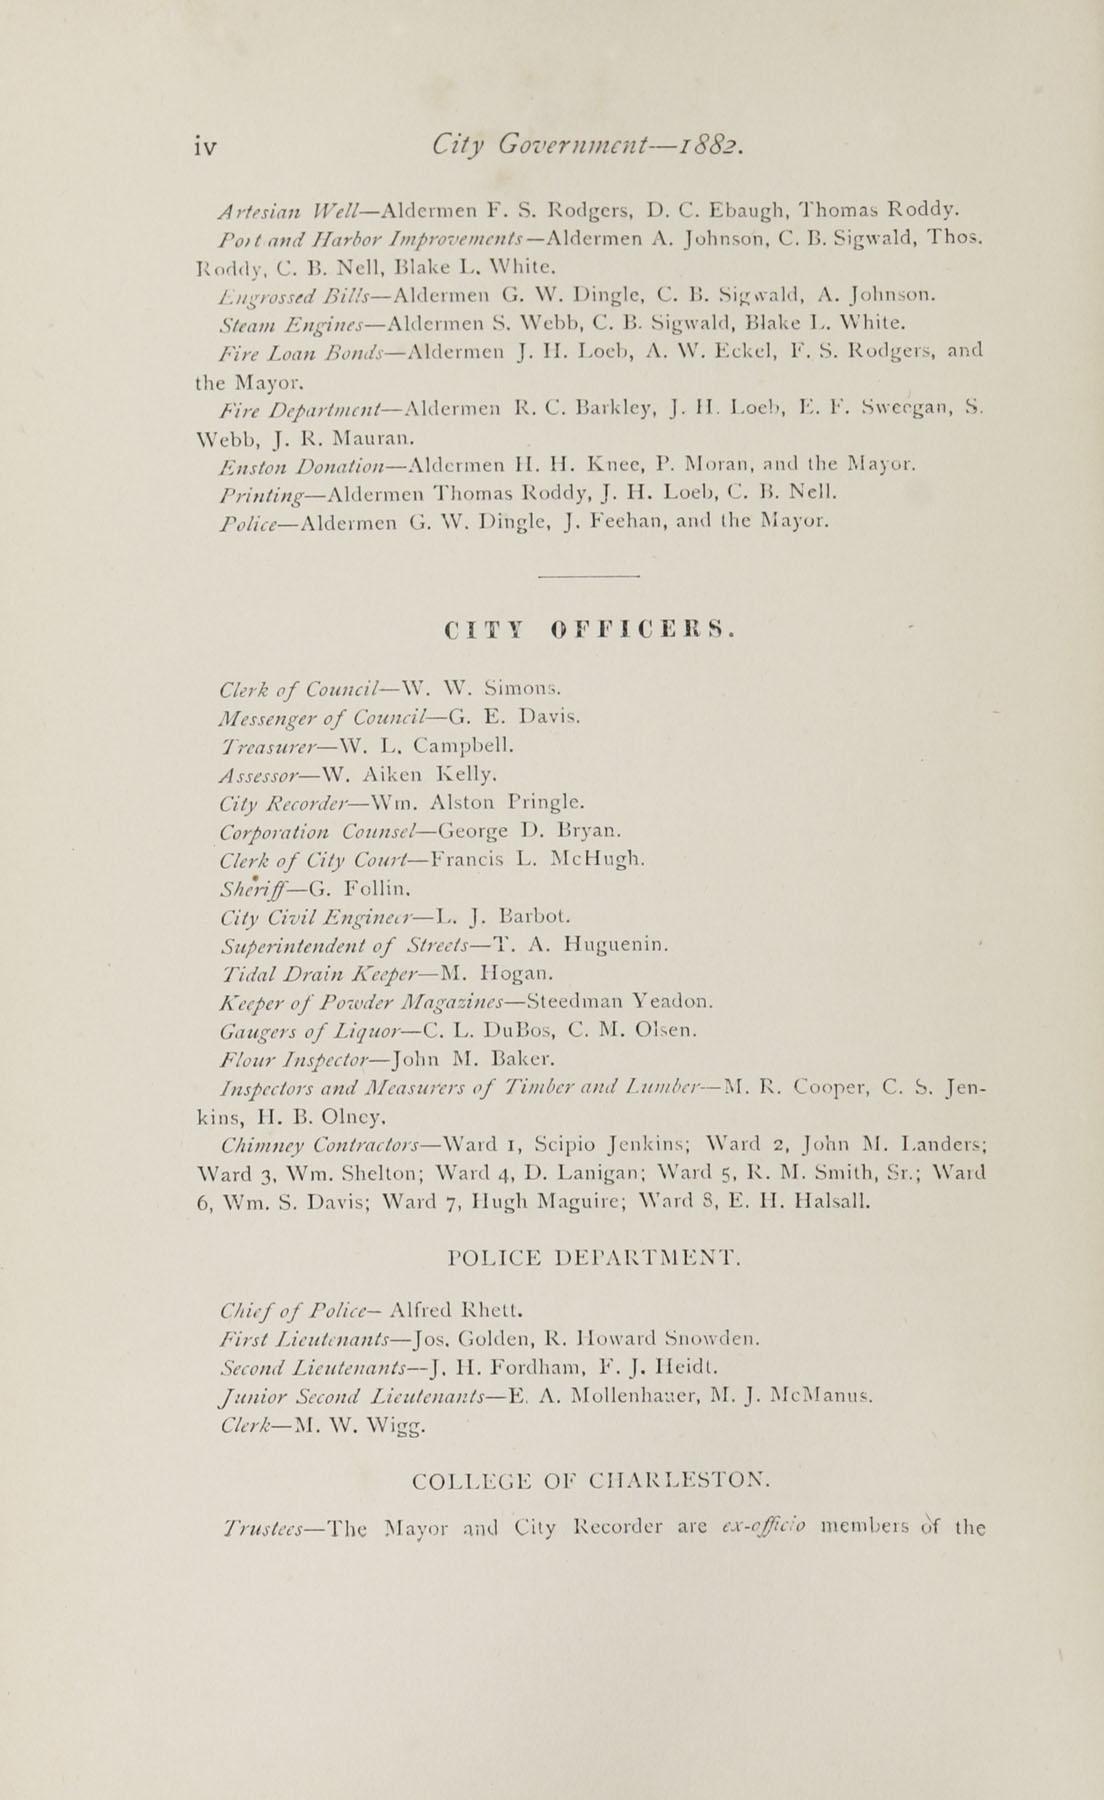 Charleston Yearbook, 1882, page iv